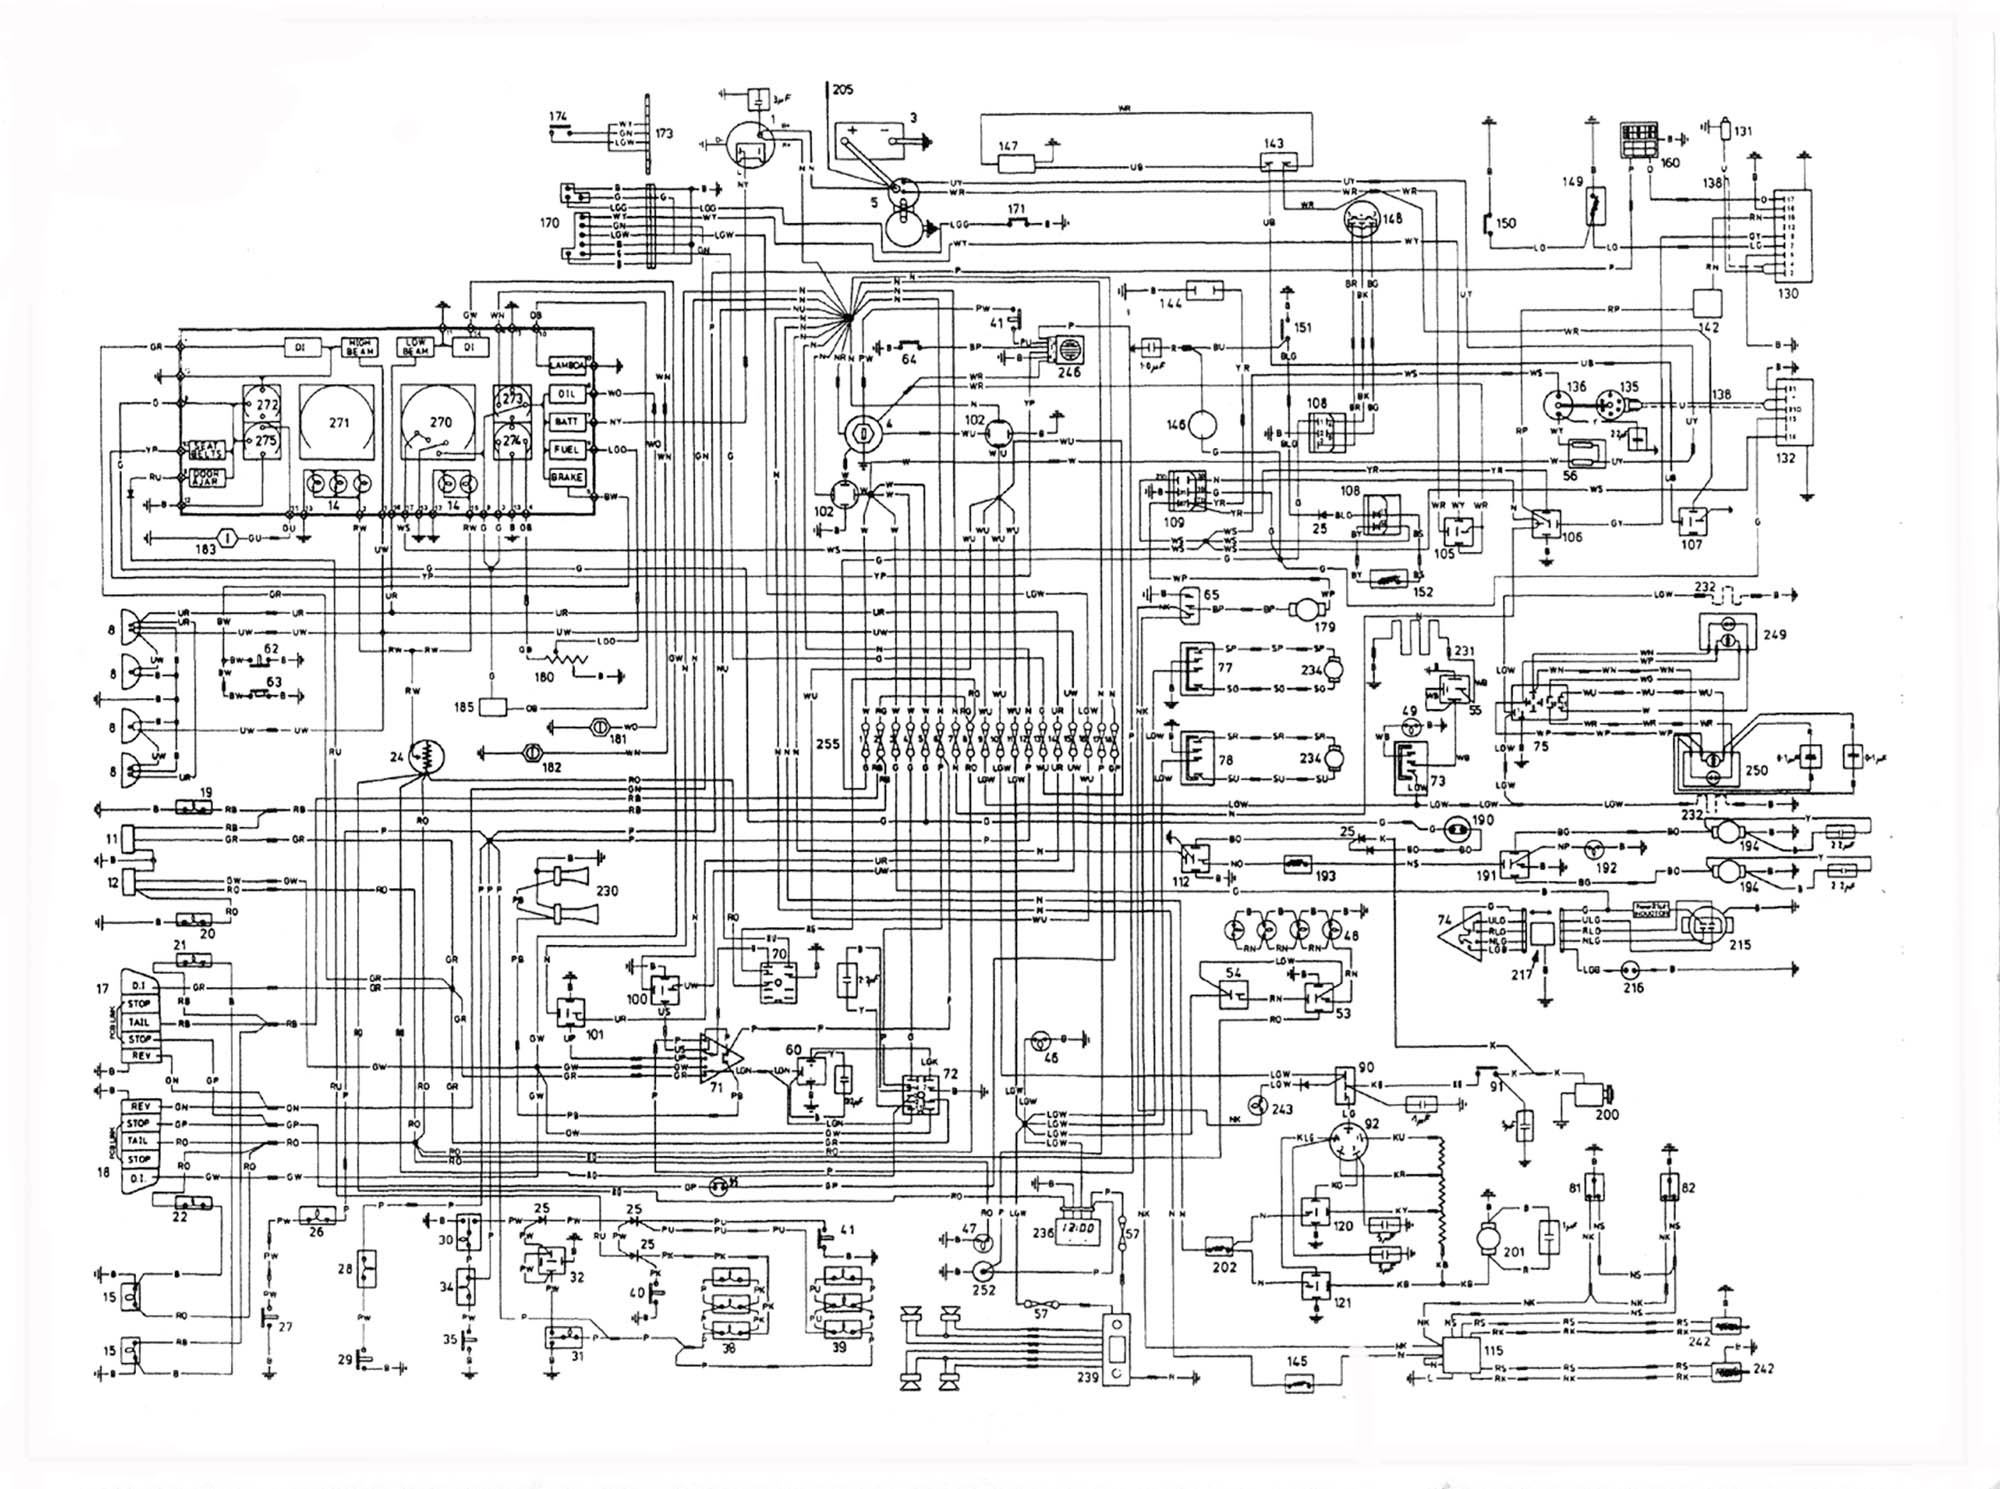 hight resolution of renault clio wiring diagram manual wiring library rh 8 insidestralsund de renault clio 2 wiring diagram renault clio 2 wiring diagram pdf